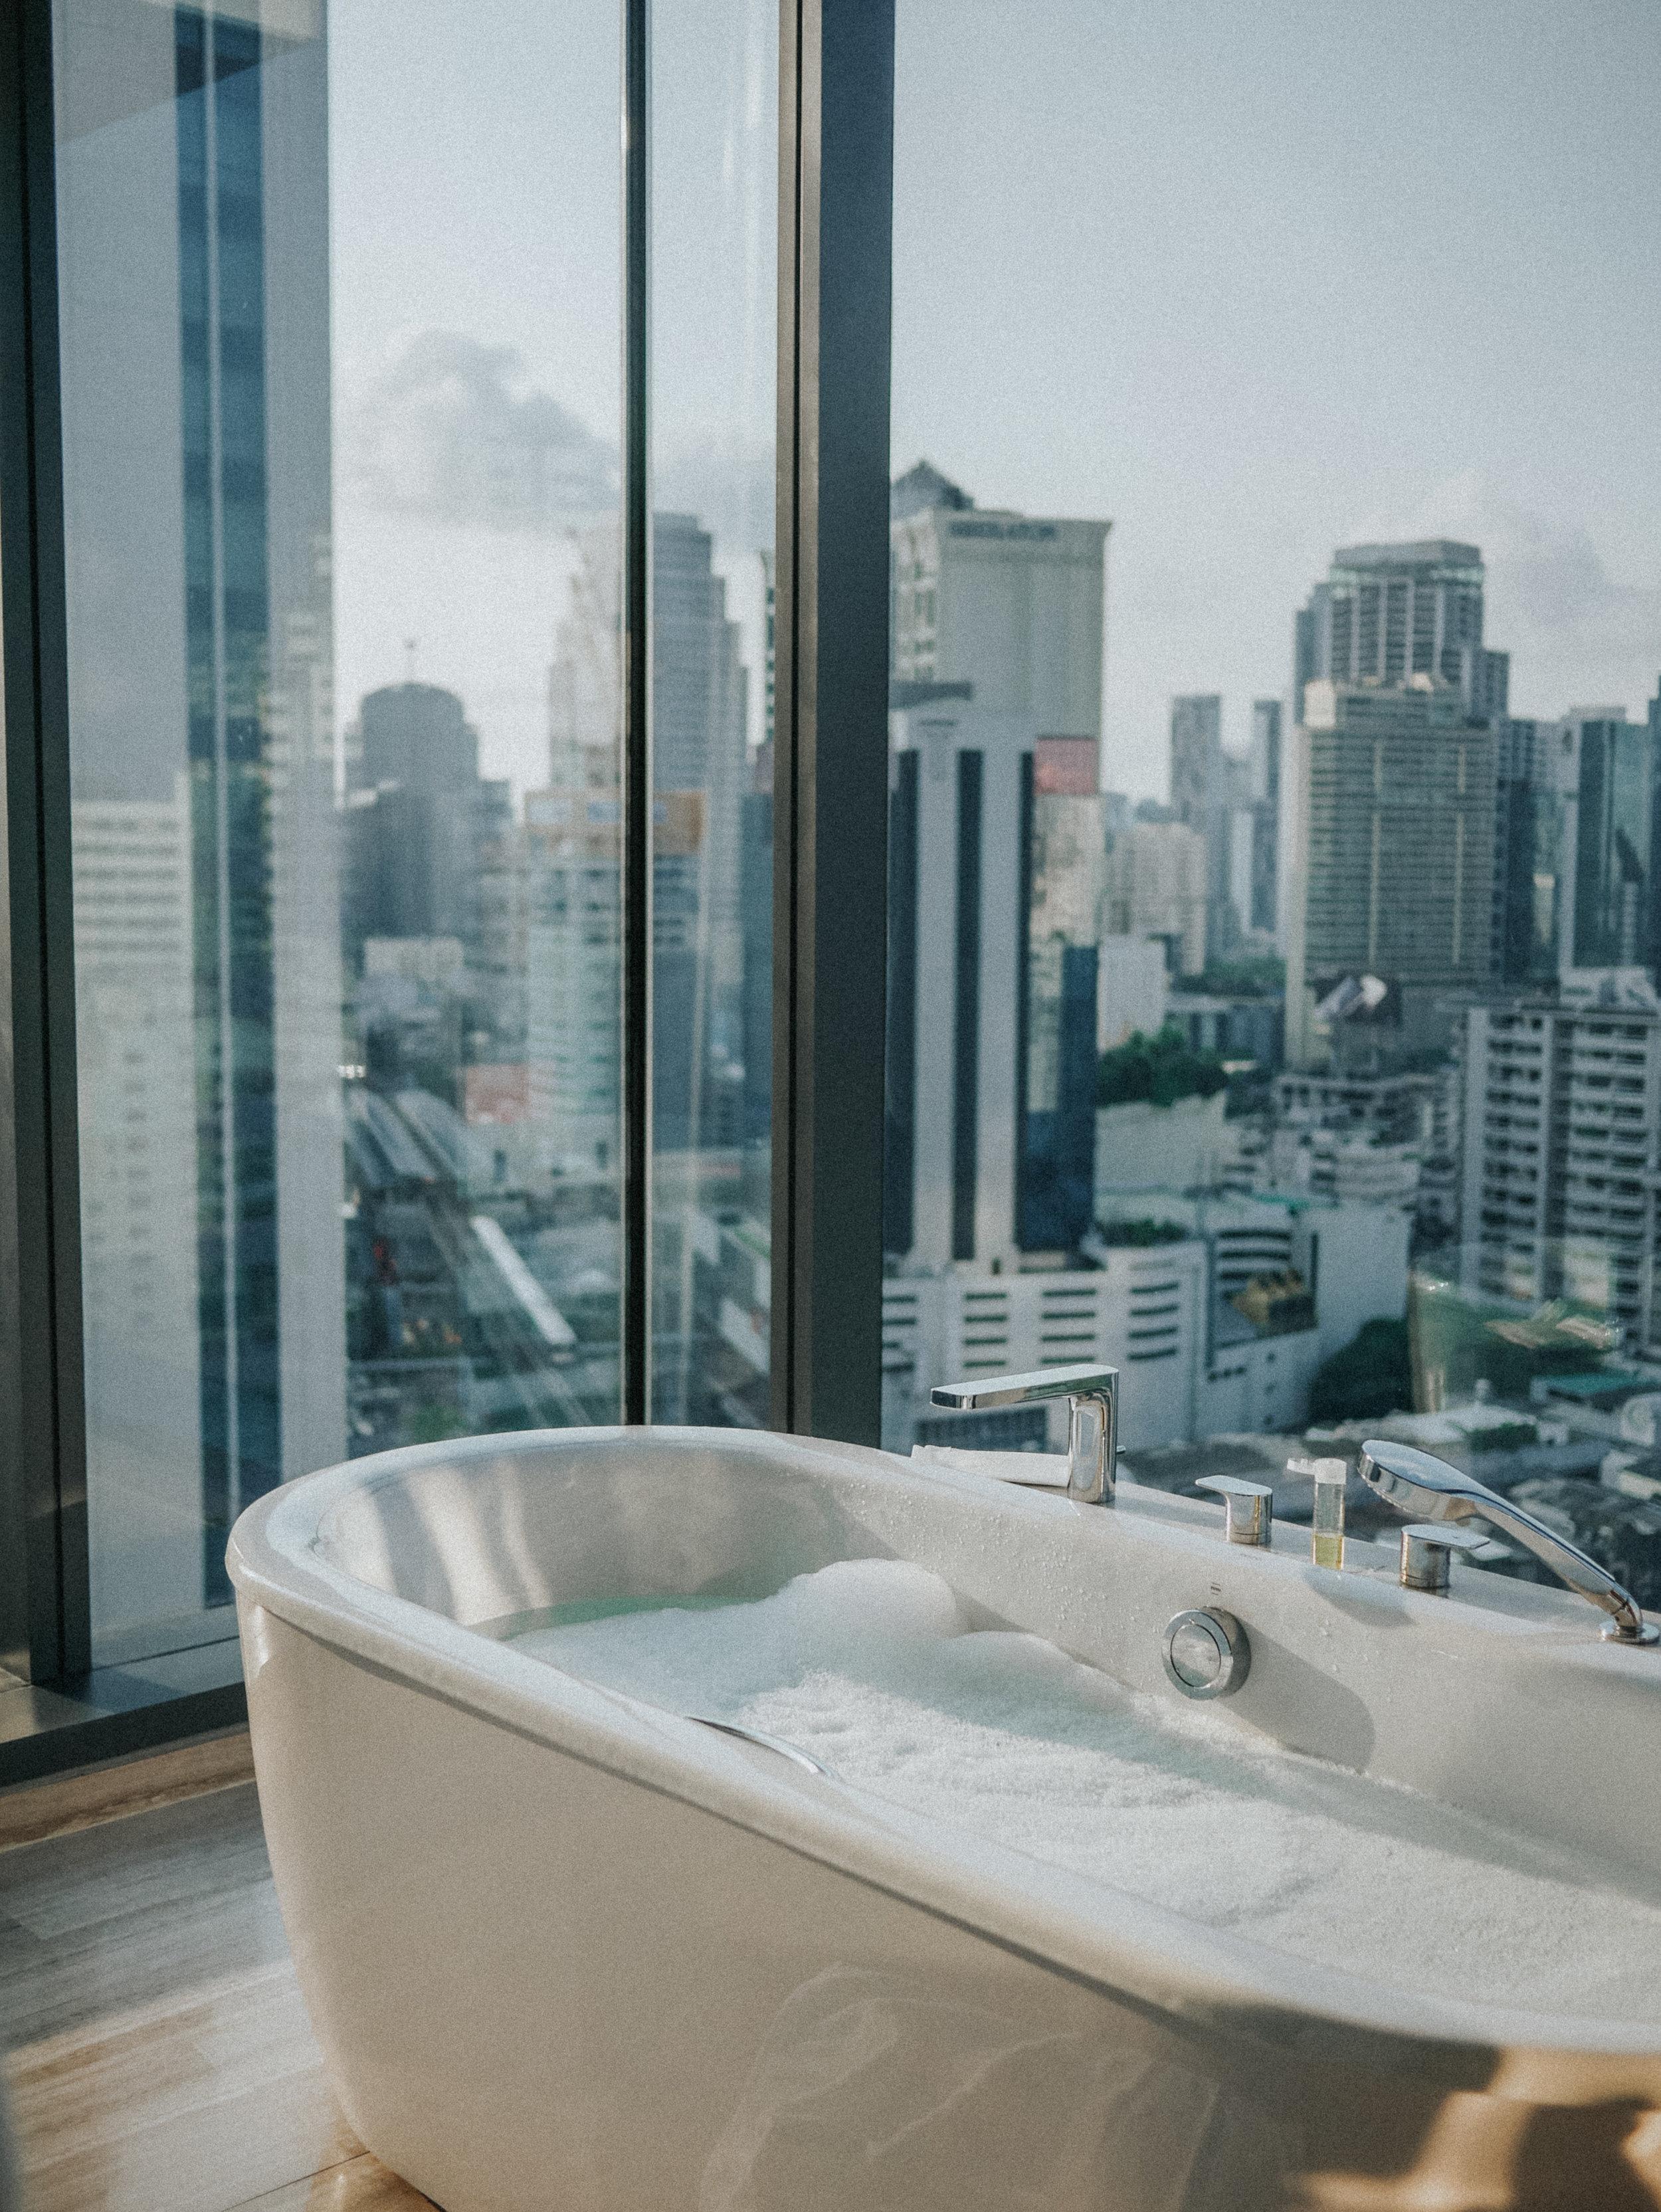 Dreamiest infinity bath tub situation